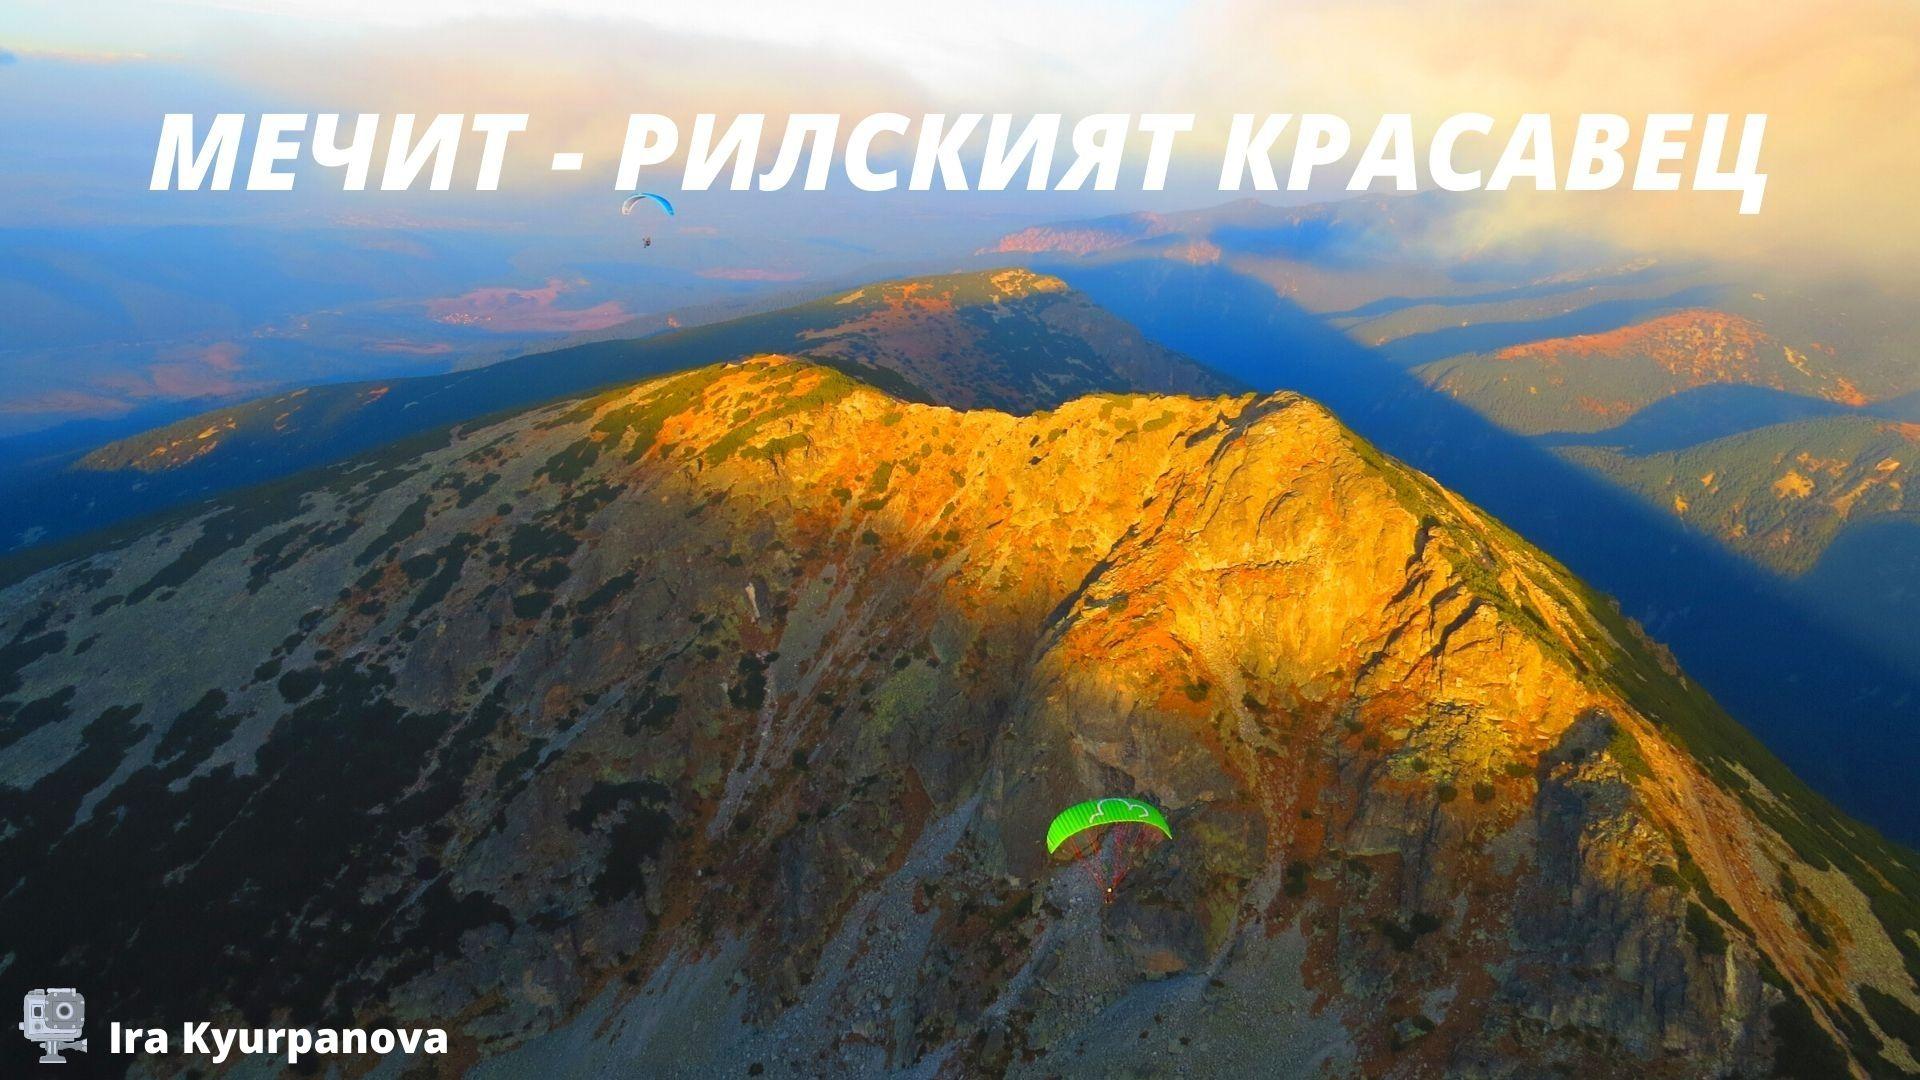 Връх Мечит, Рила планина3